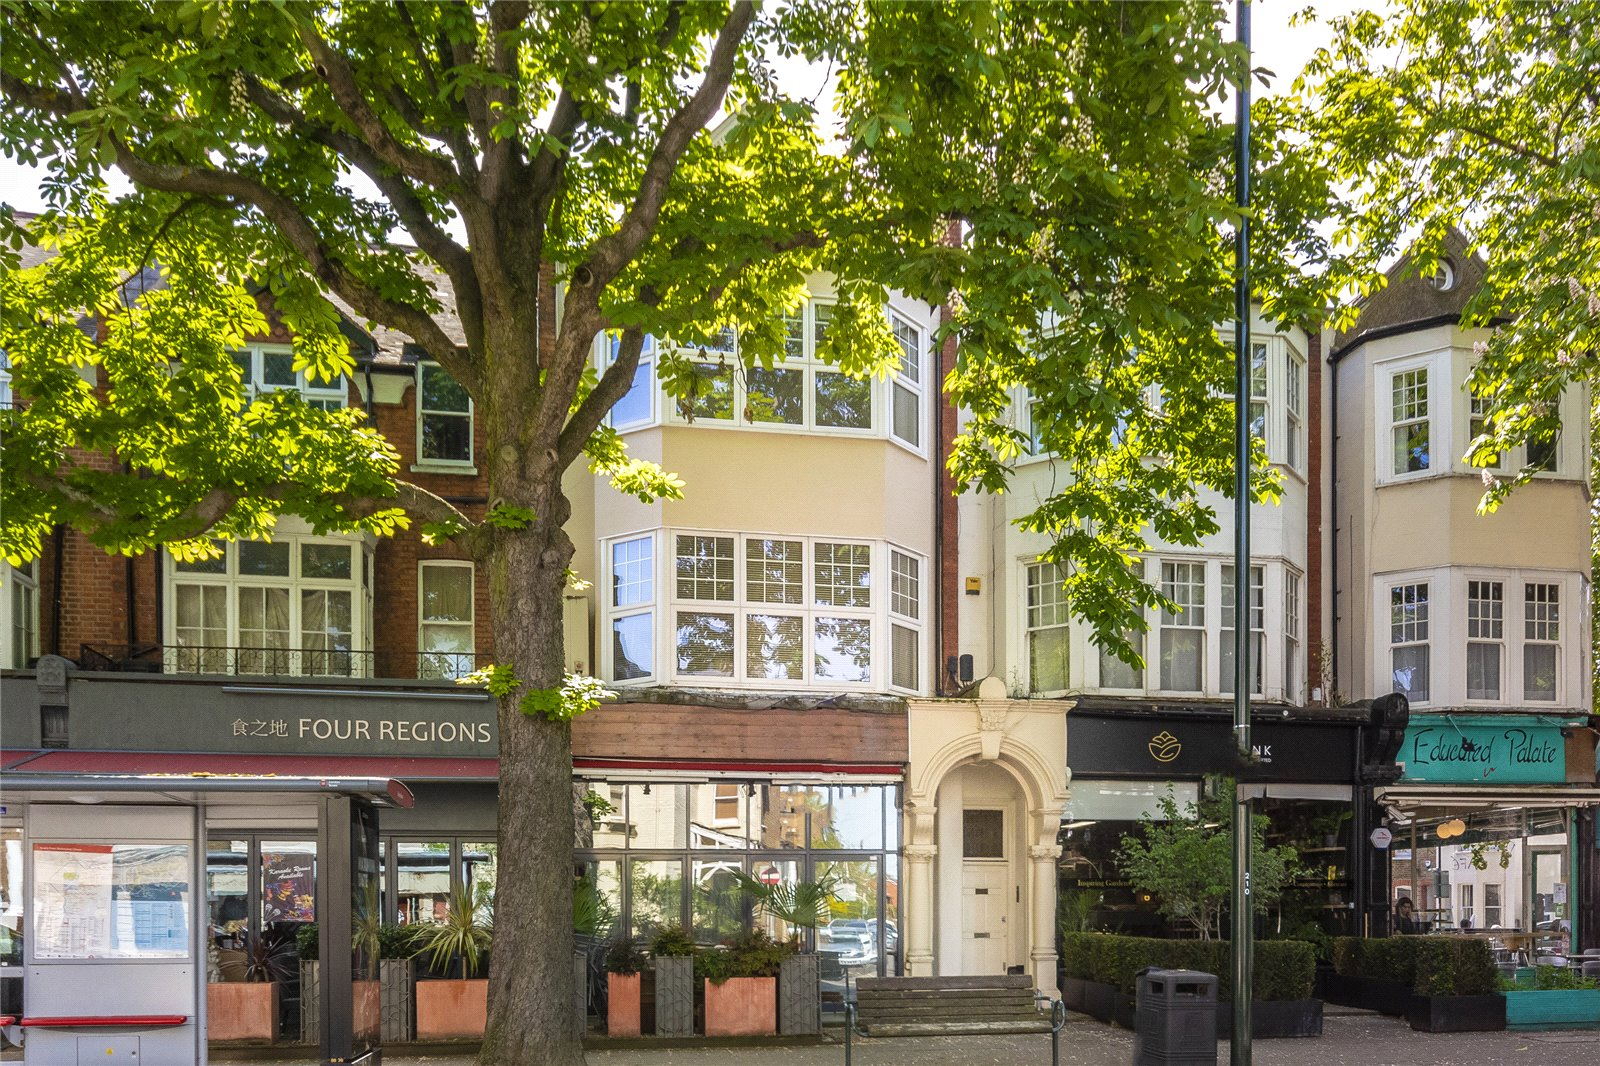 Evelyn Mansions, 100 Kew Road, TW9 2PQ - Antony Roberts